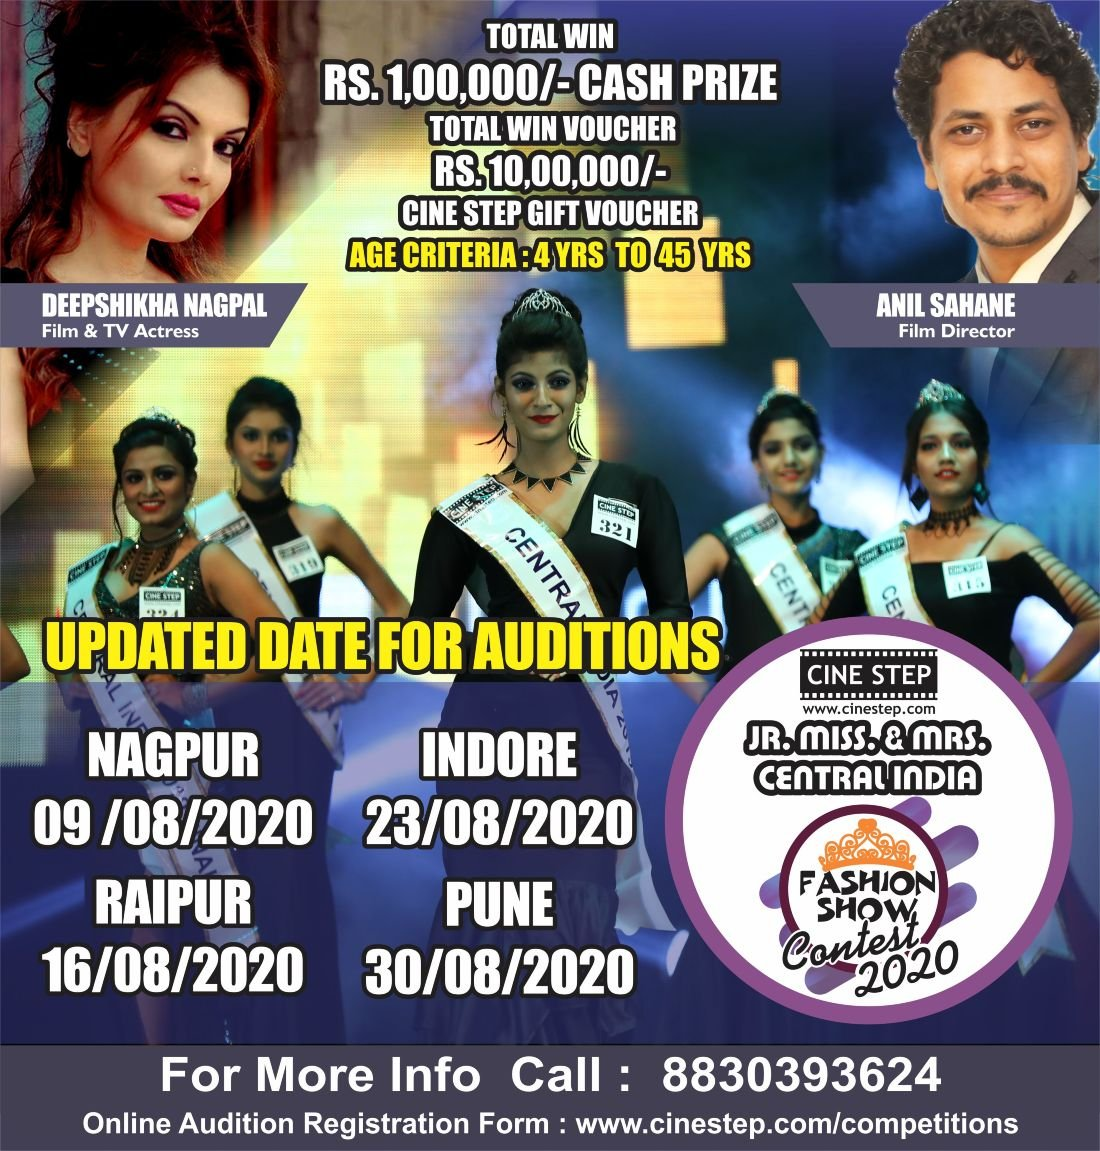 CINE STEP  JR. MISS & MRS CENTRAL INDIA FASHION SHOW CONTEST 2020 NAGPUR AUDITION